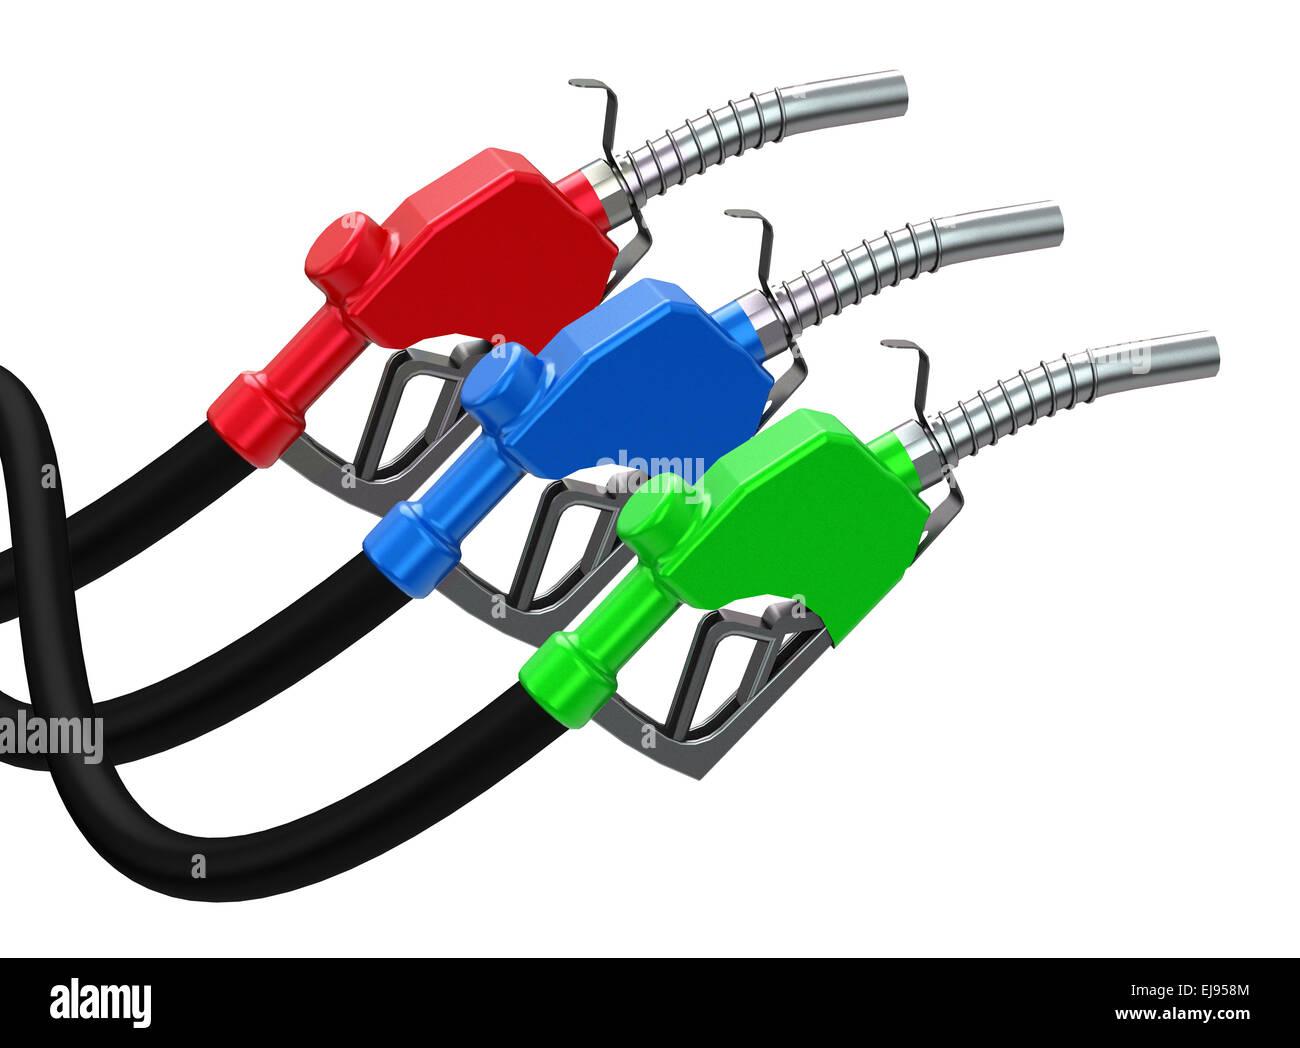 the fuel nozzles Stock Photo